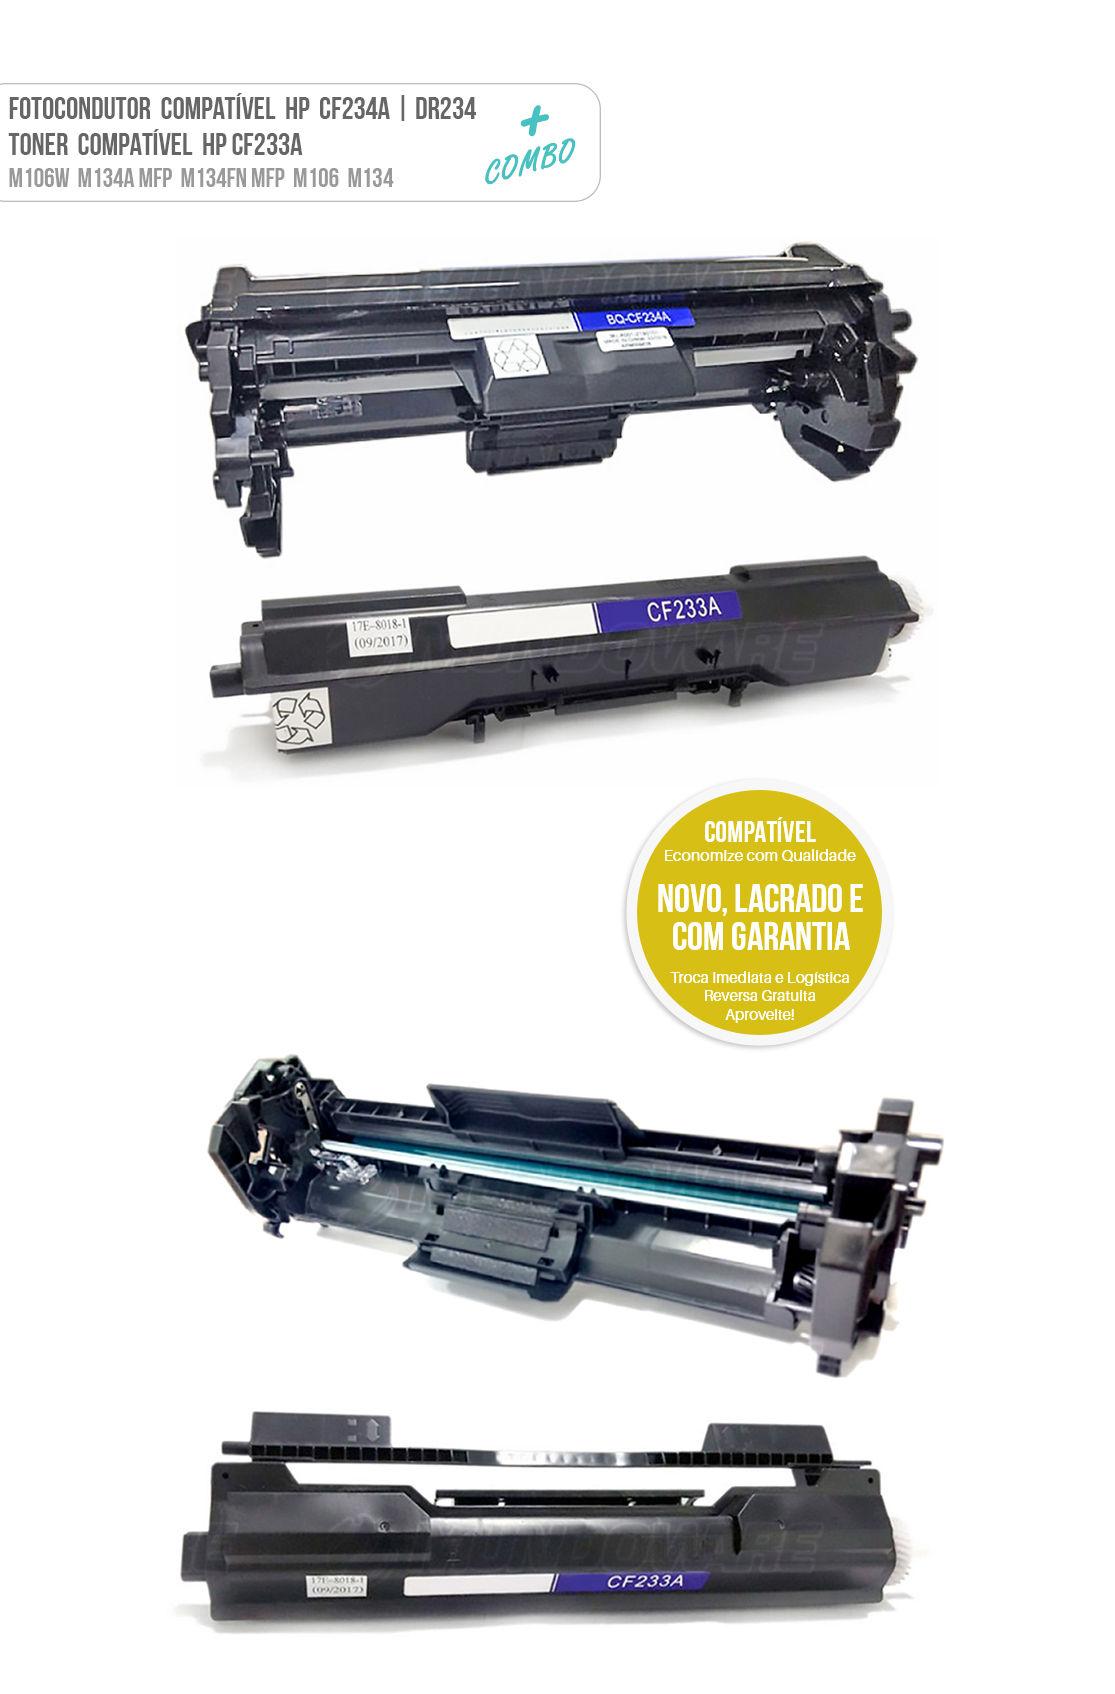 Cartucho de Cilindro Fotocondutor Compatível CF234 DR234A e Toner CF233A para impressora HP M106W M134A MFP M134FN MFP M106 M134